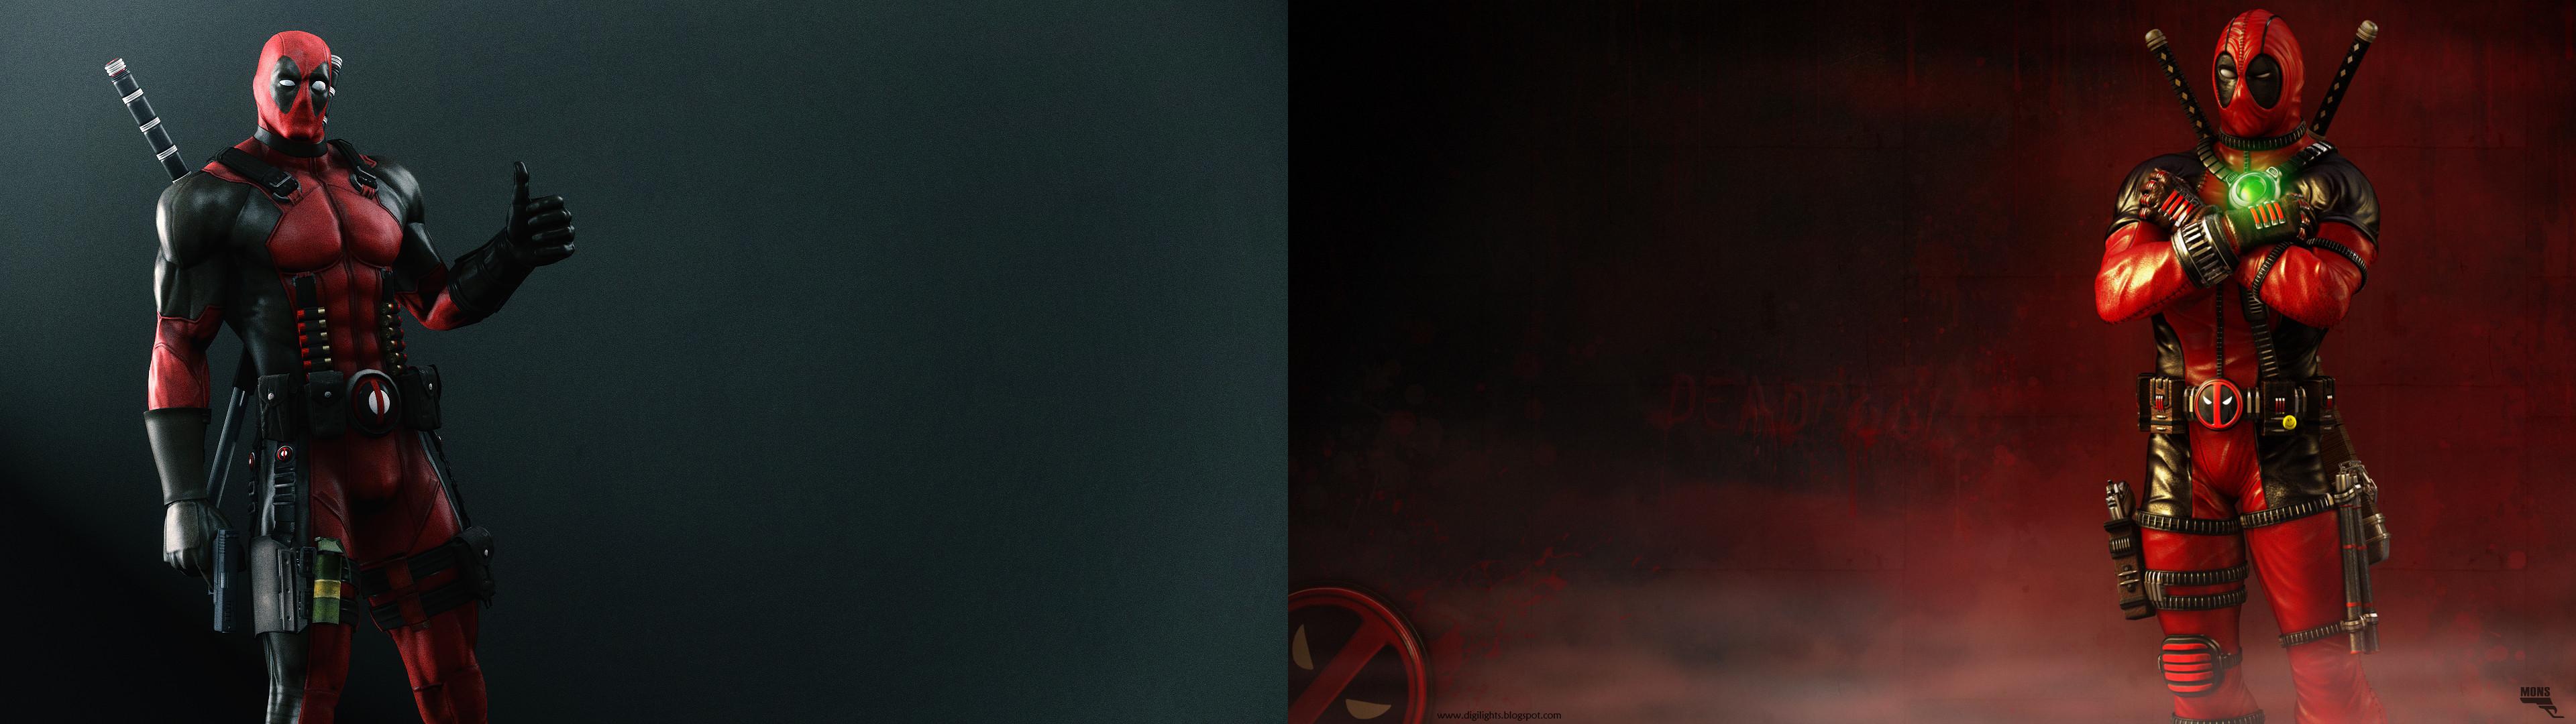 Deadpool Wallpaper (Dual Monitor, 3840 X 1080) …